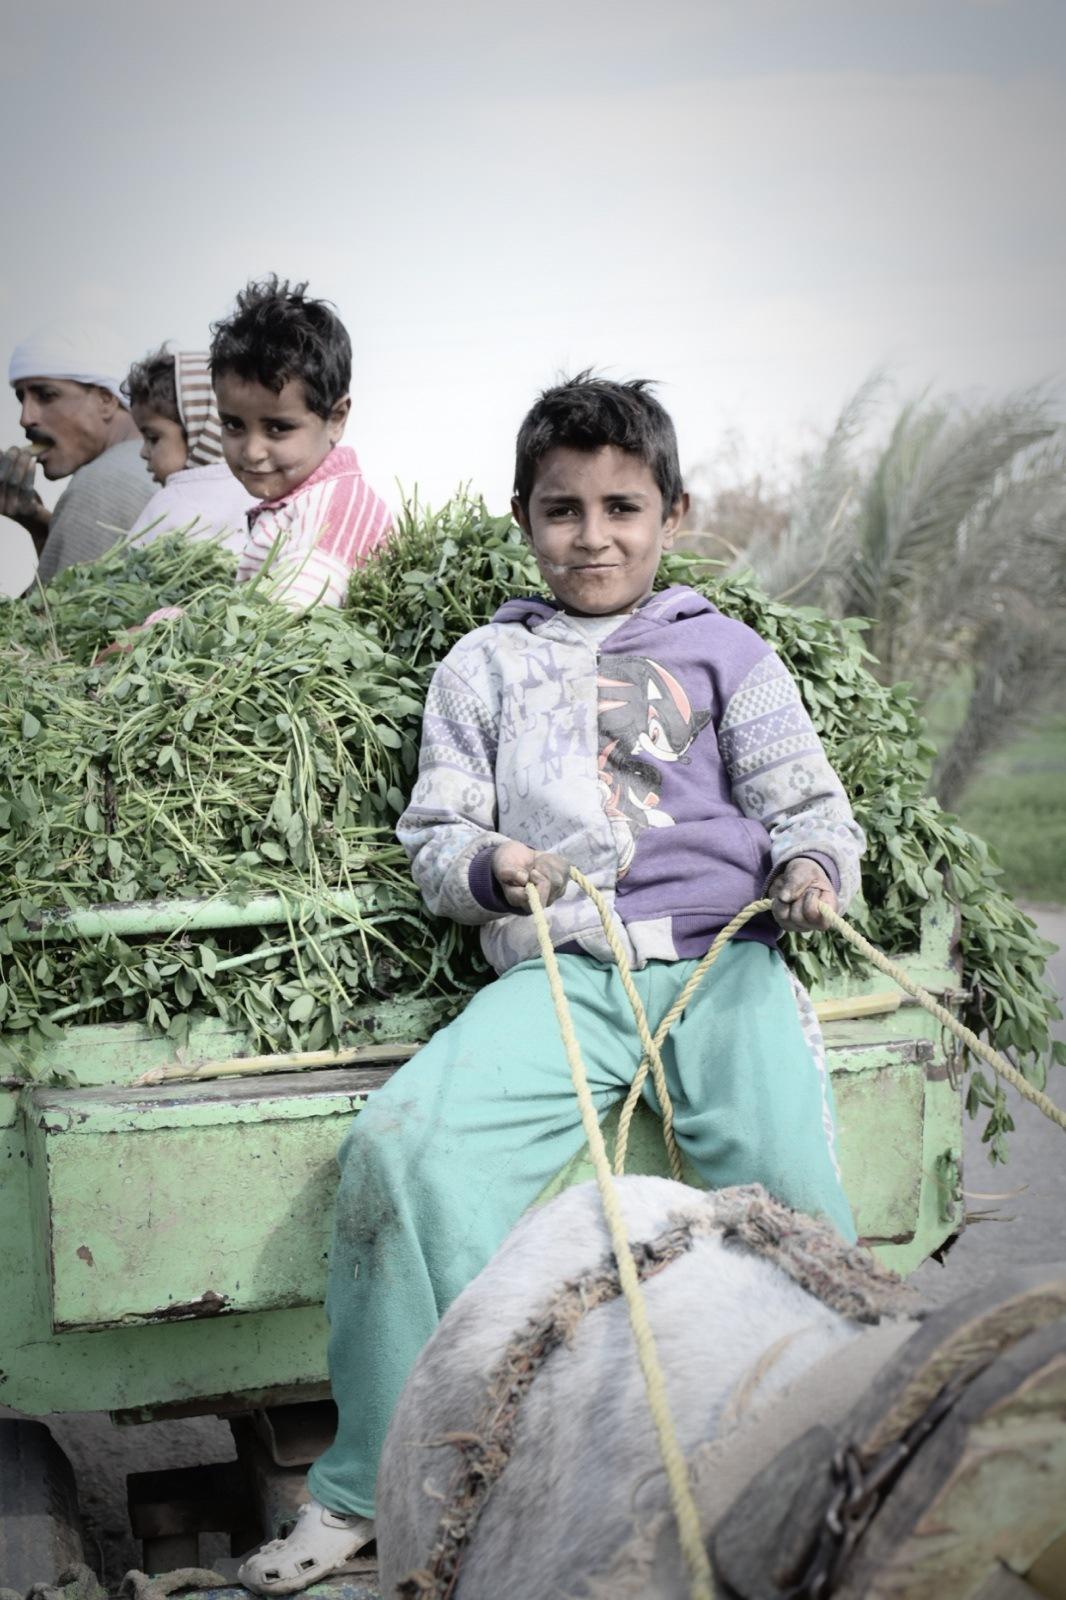 Boy from ubber egypt by eslamthabet81